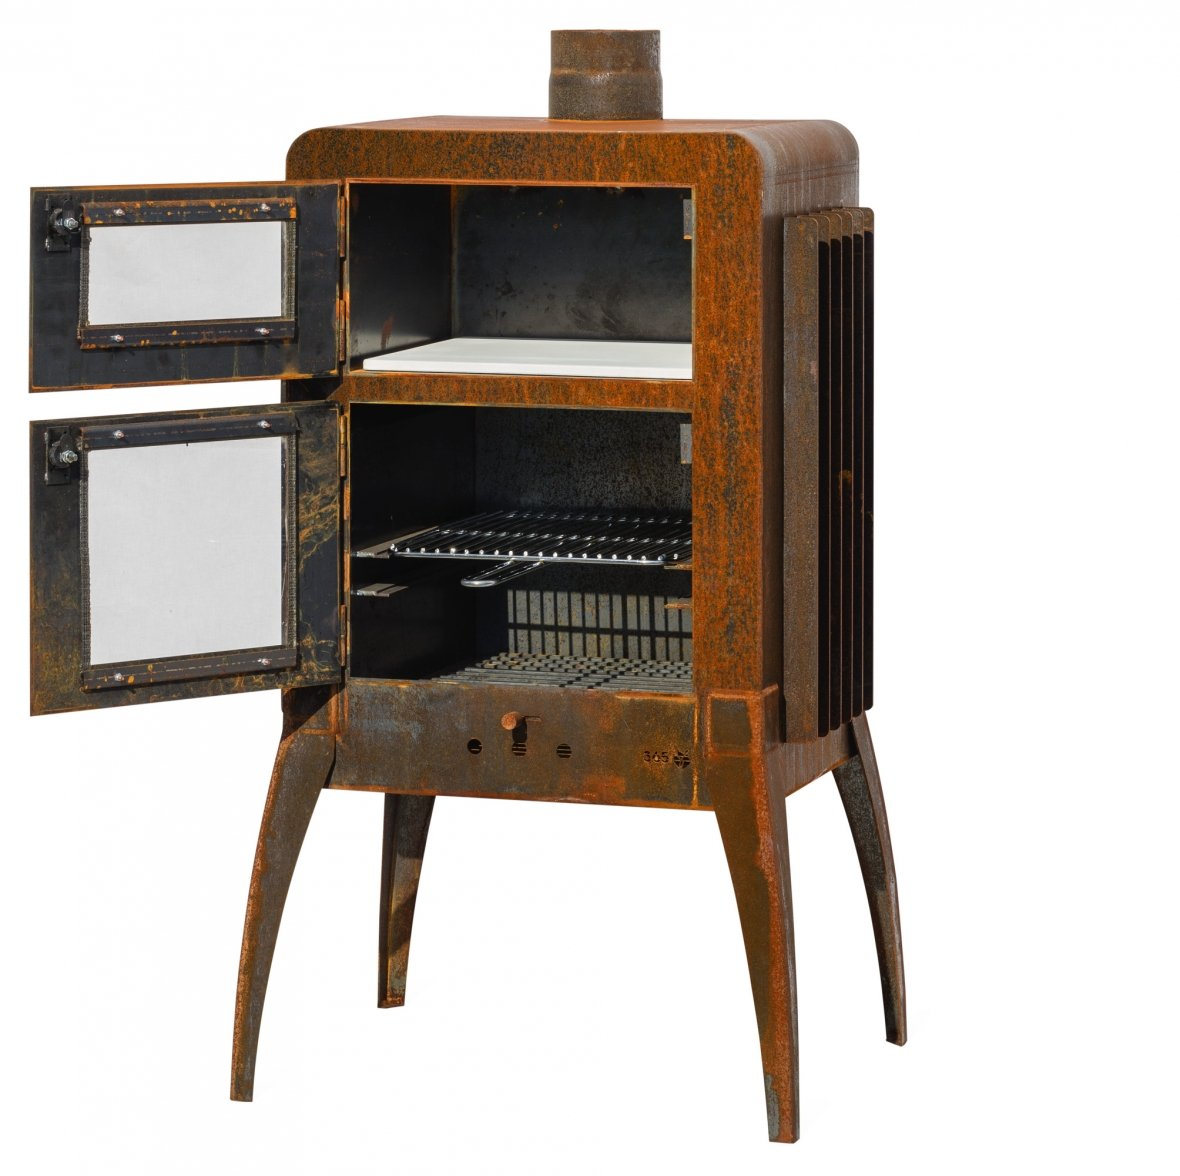 Openhaardontwerp met industriële vintage look